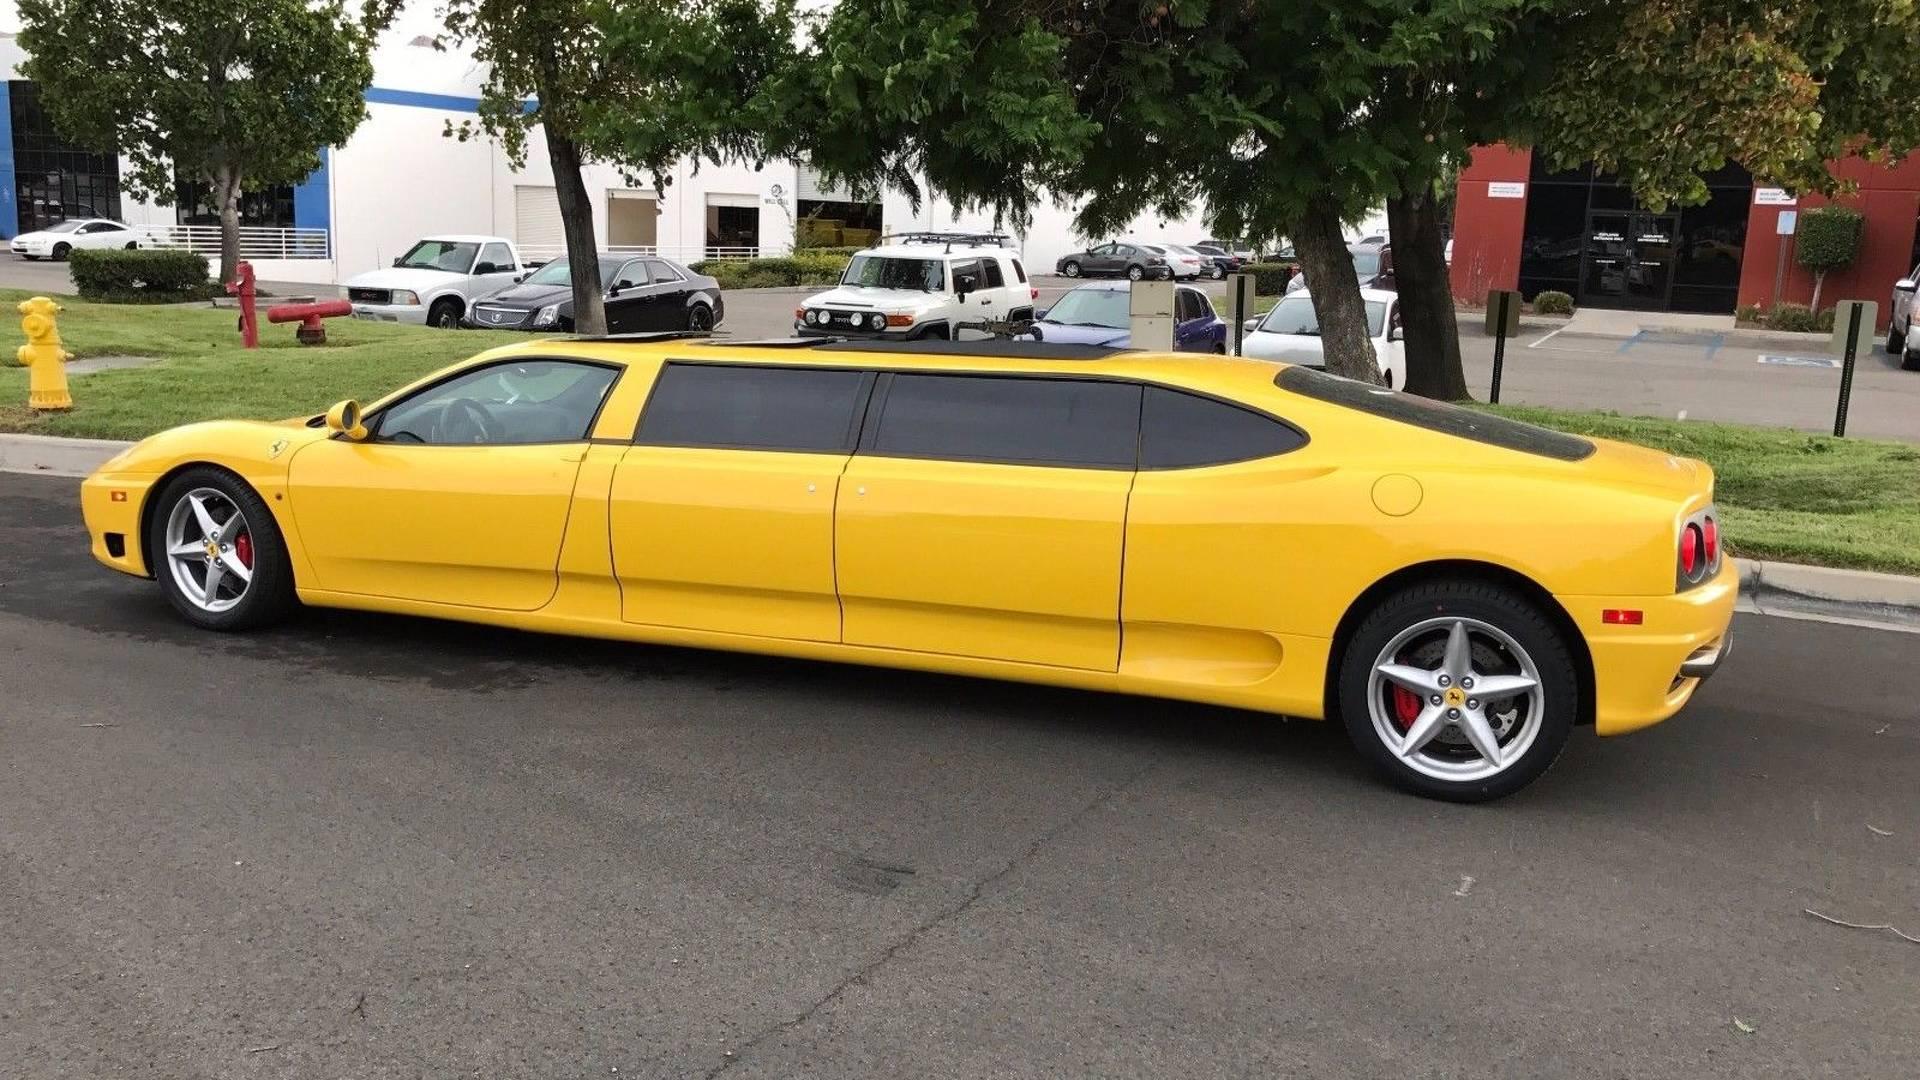 Ferrari 360 Limo Gets $104,400 Bid On eBay, But Fails To Sell